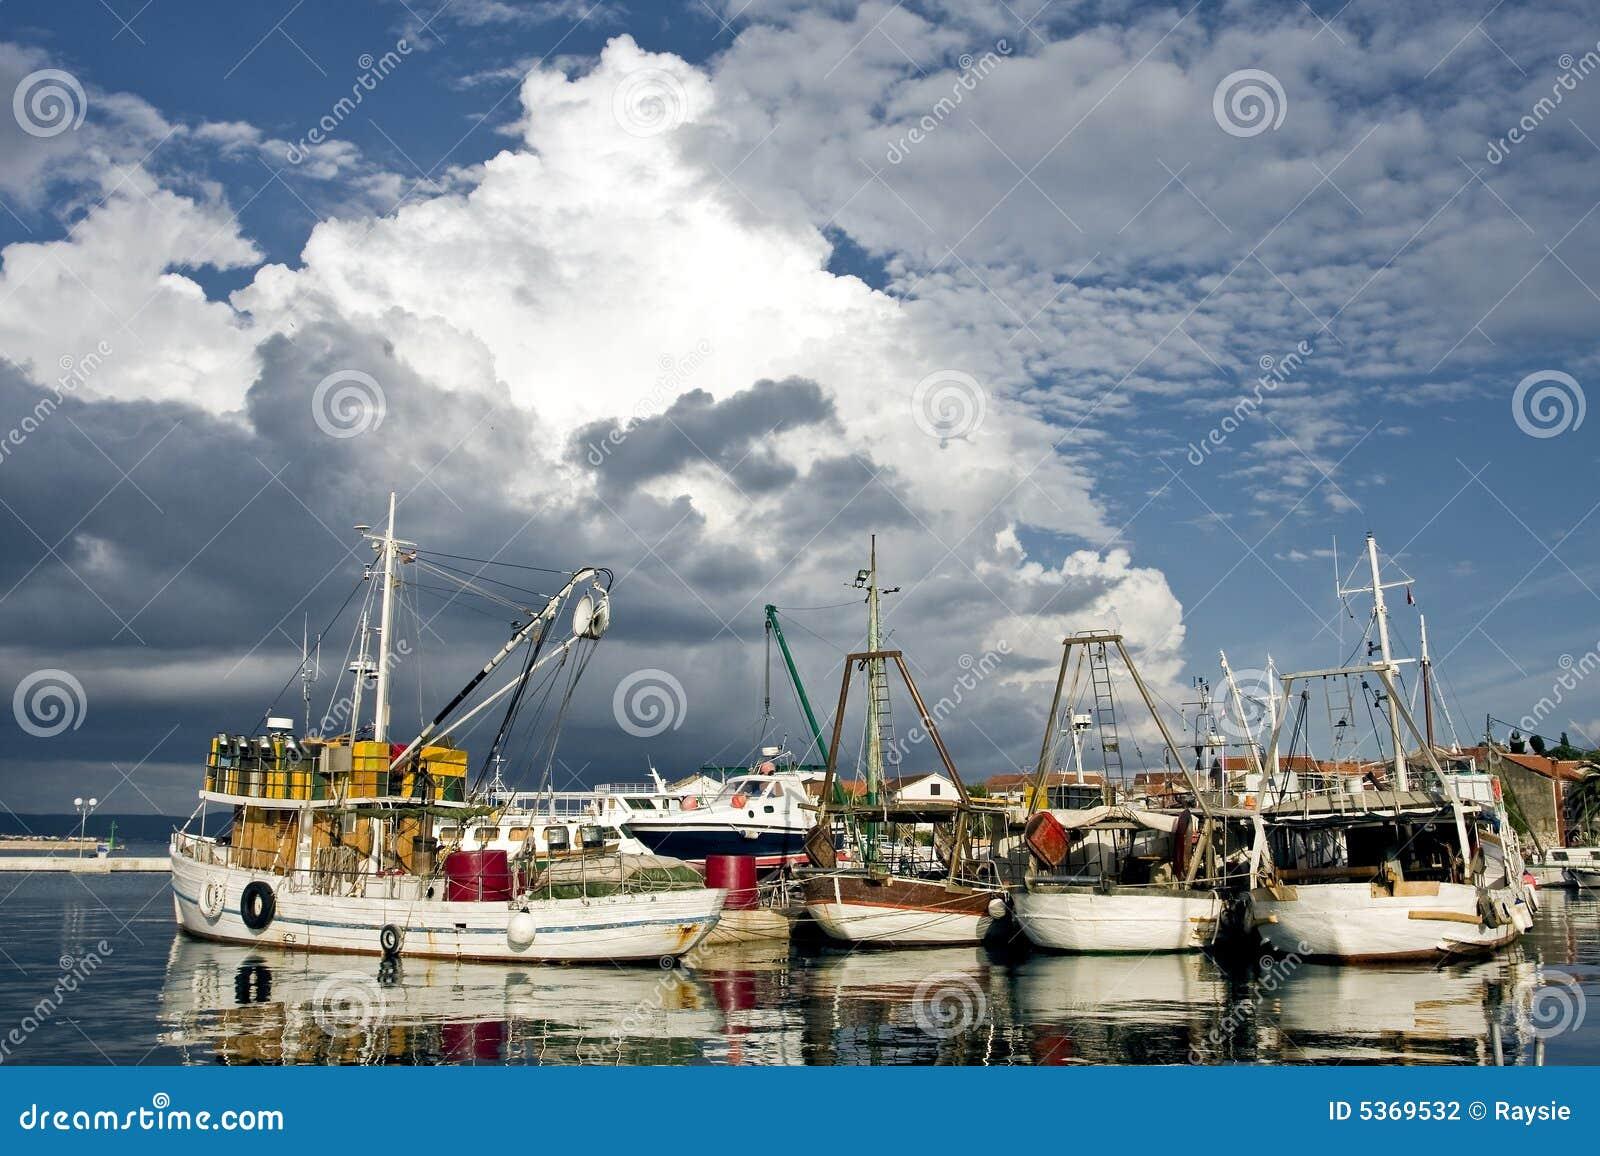 Fishing boats in croatia stock photography image 5369532 for Fishing in croatia